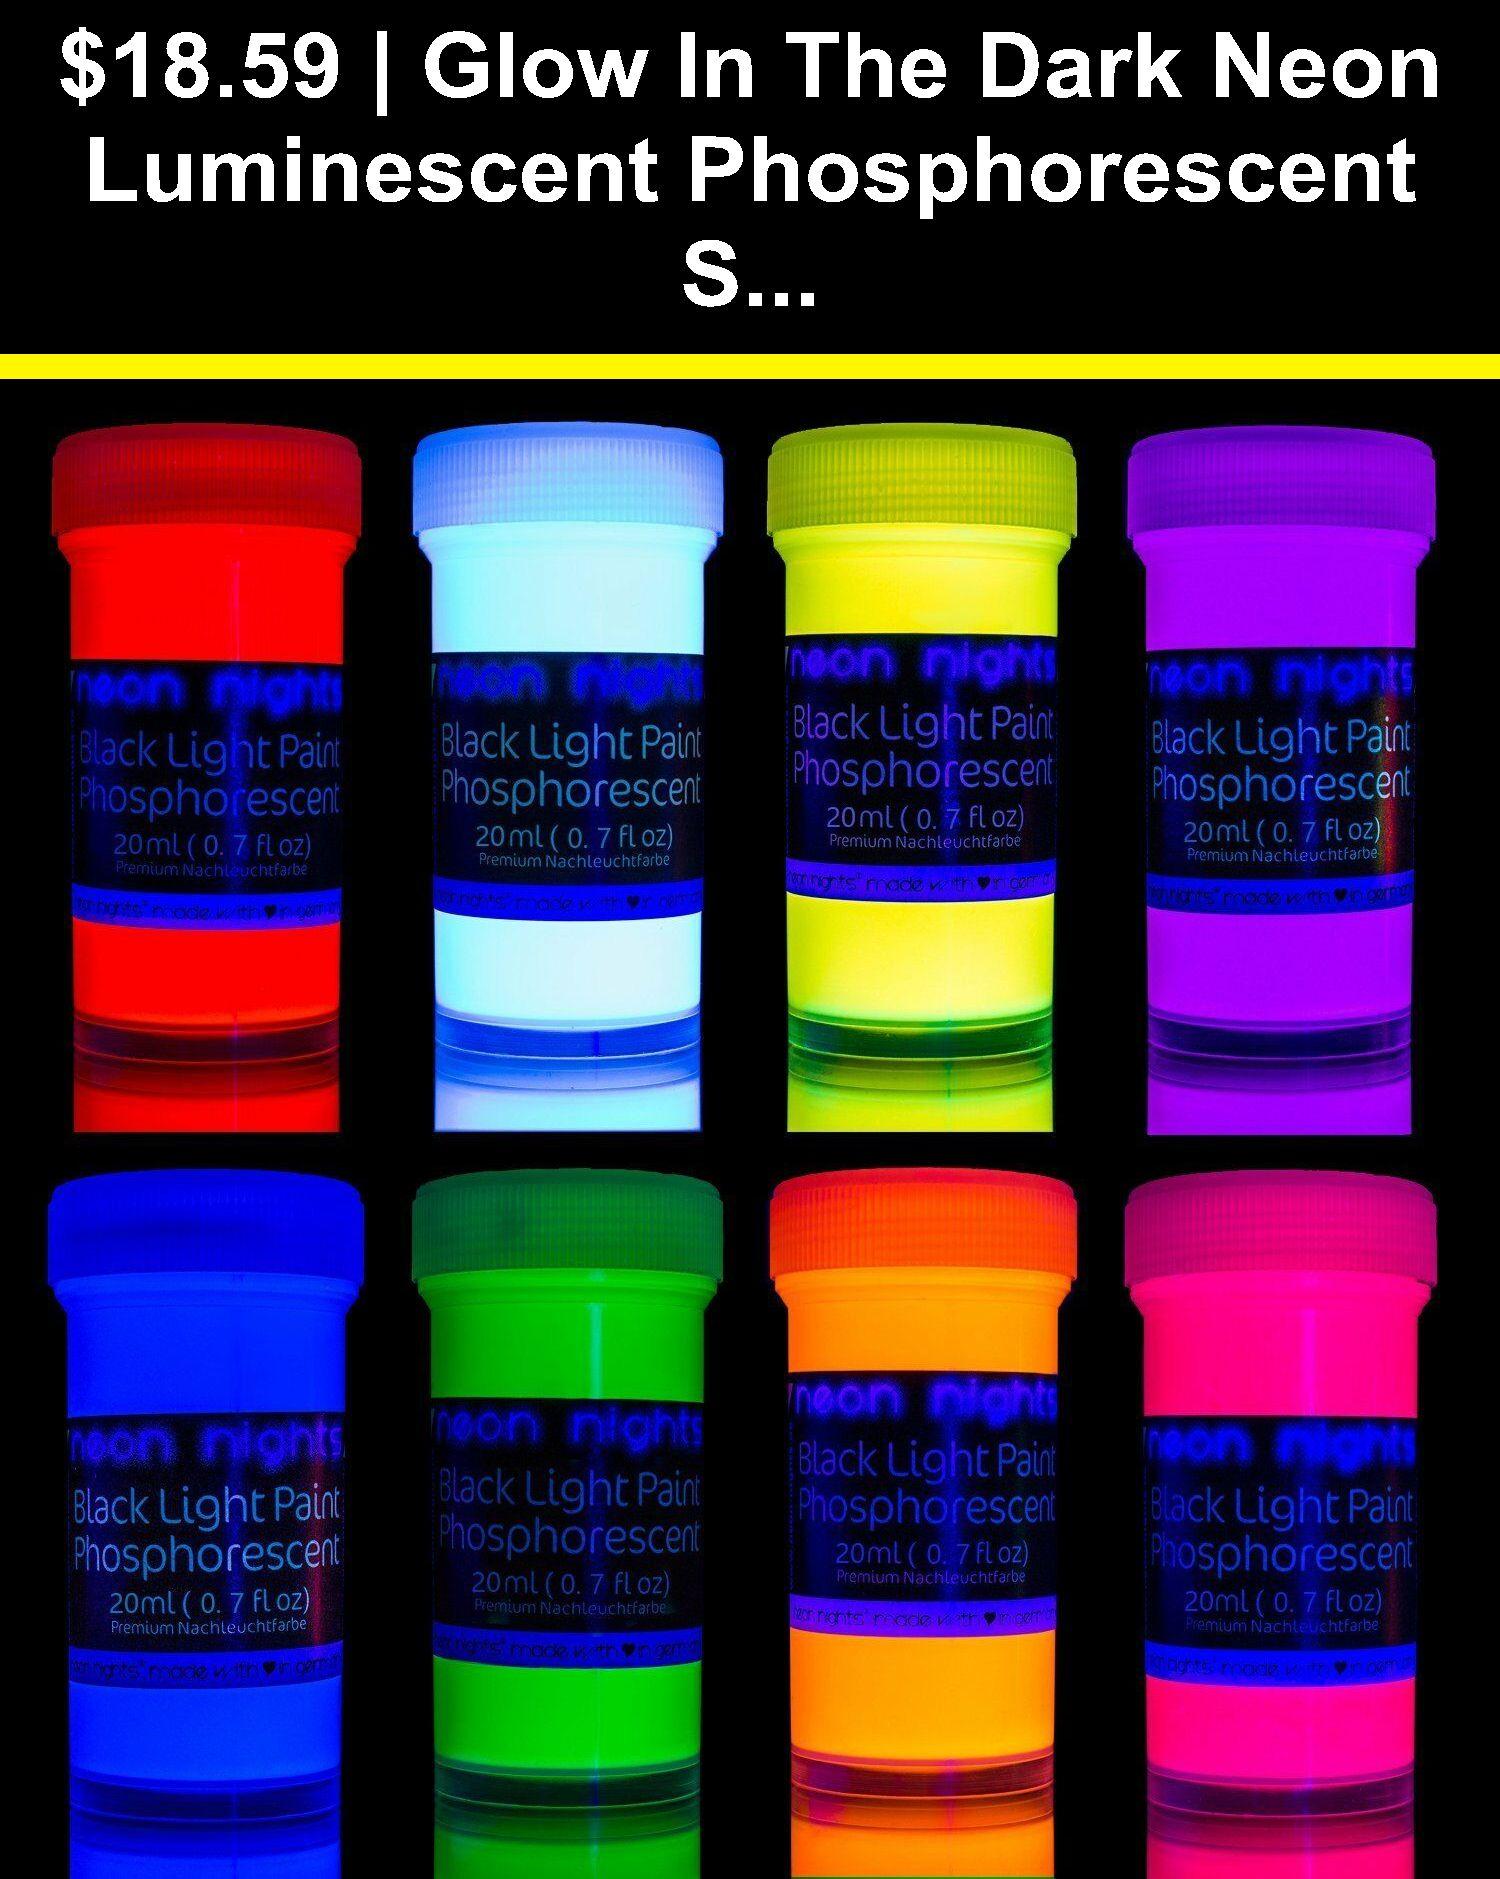 Acrylic paint 31401 glow in the dark neon luminescent